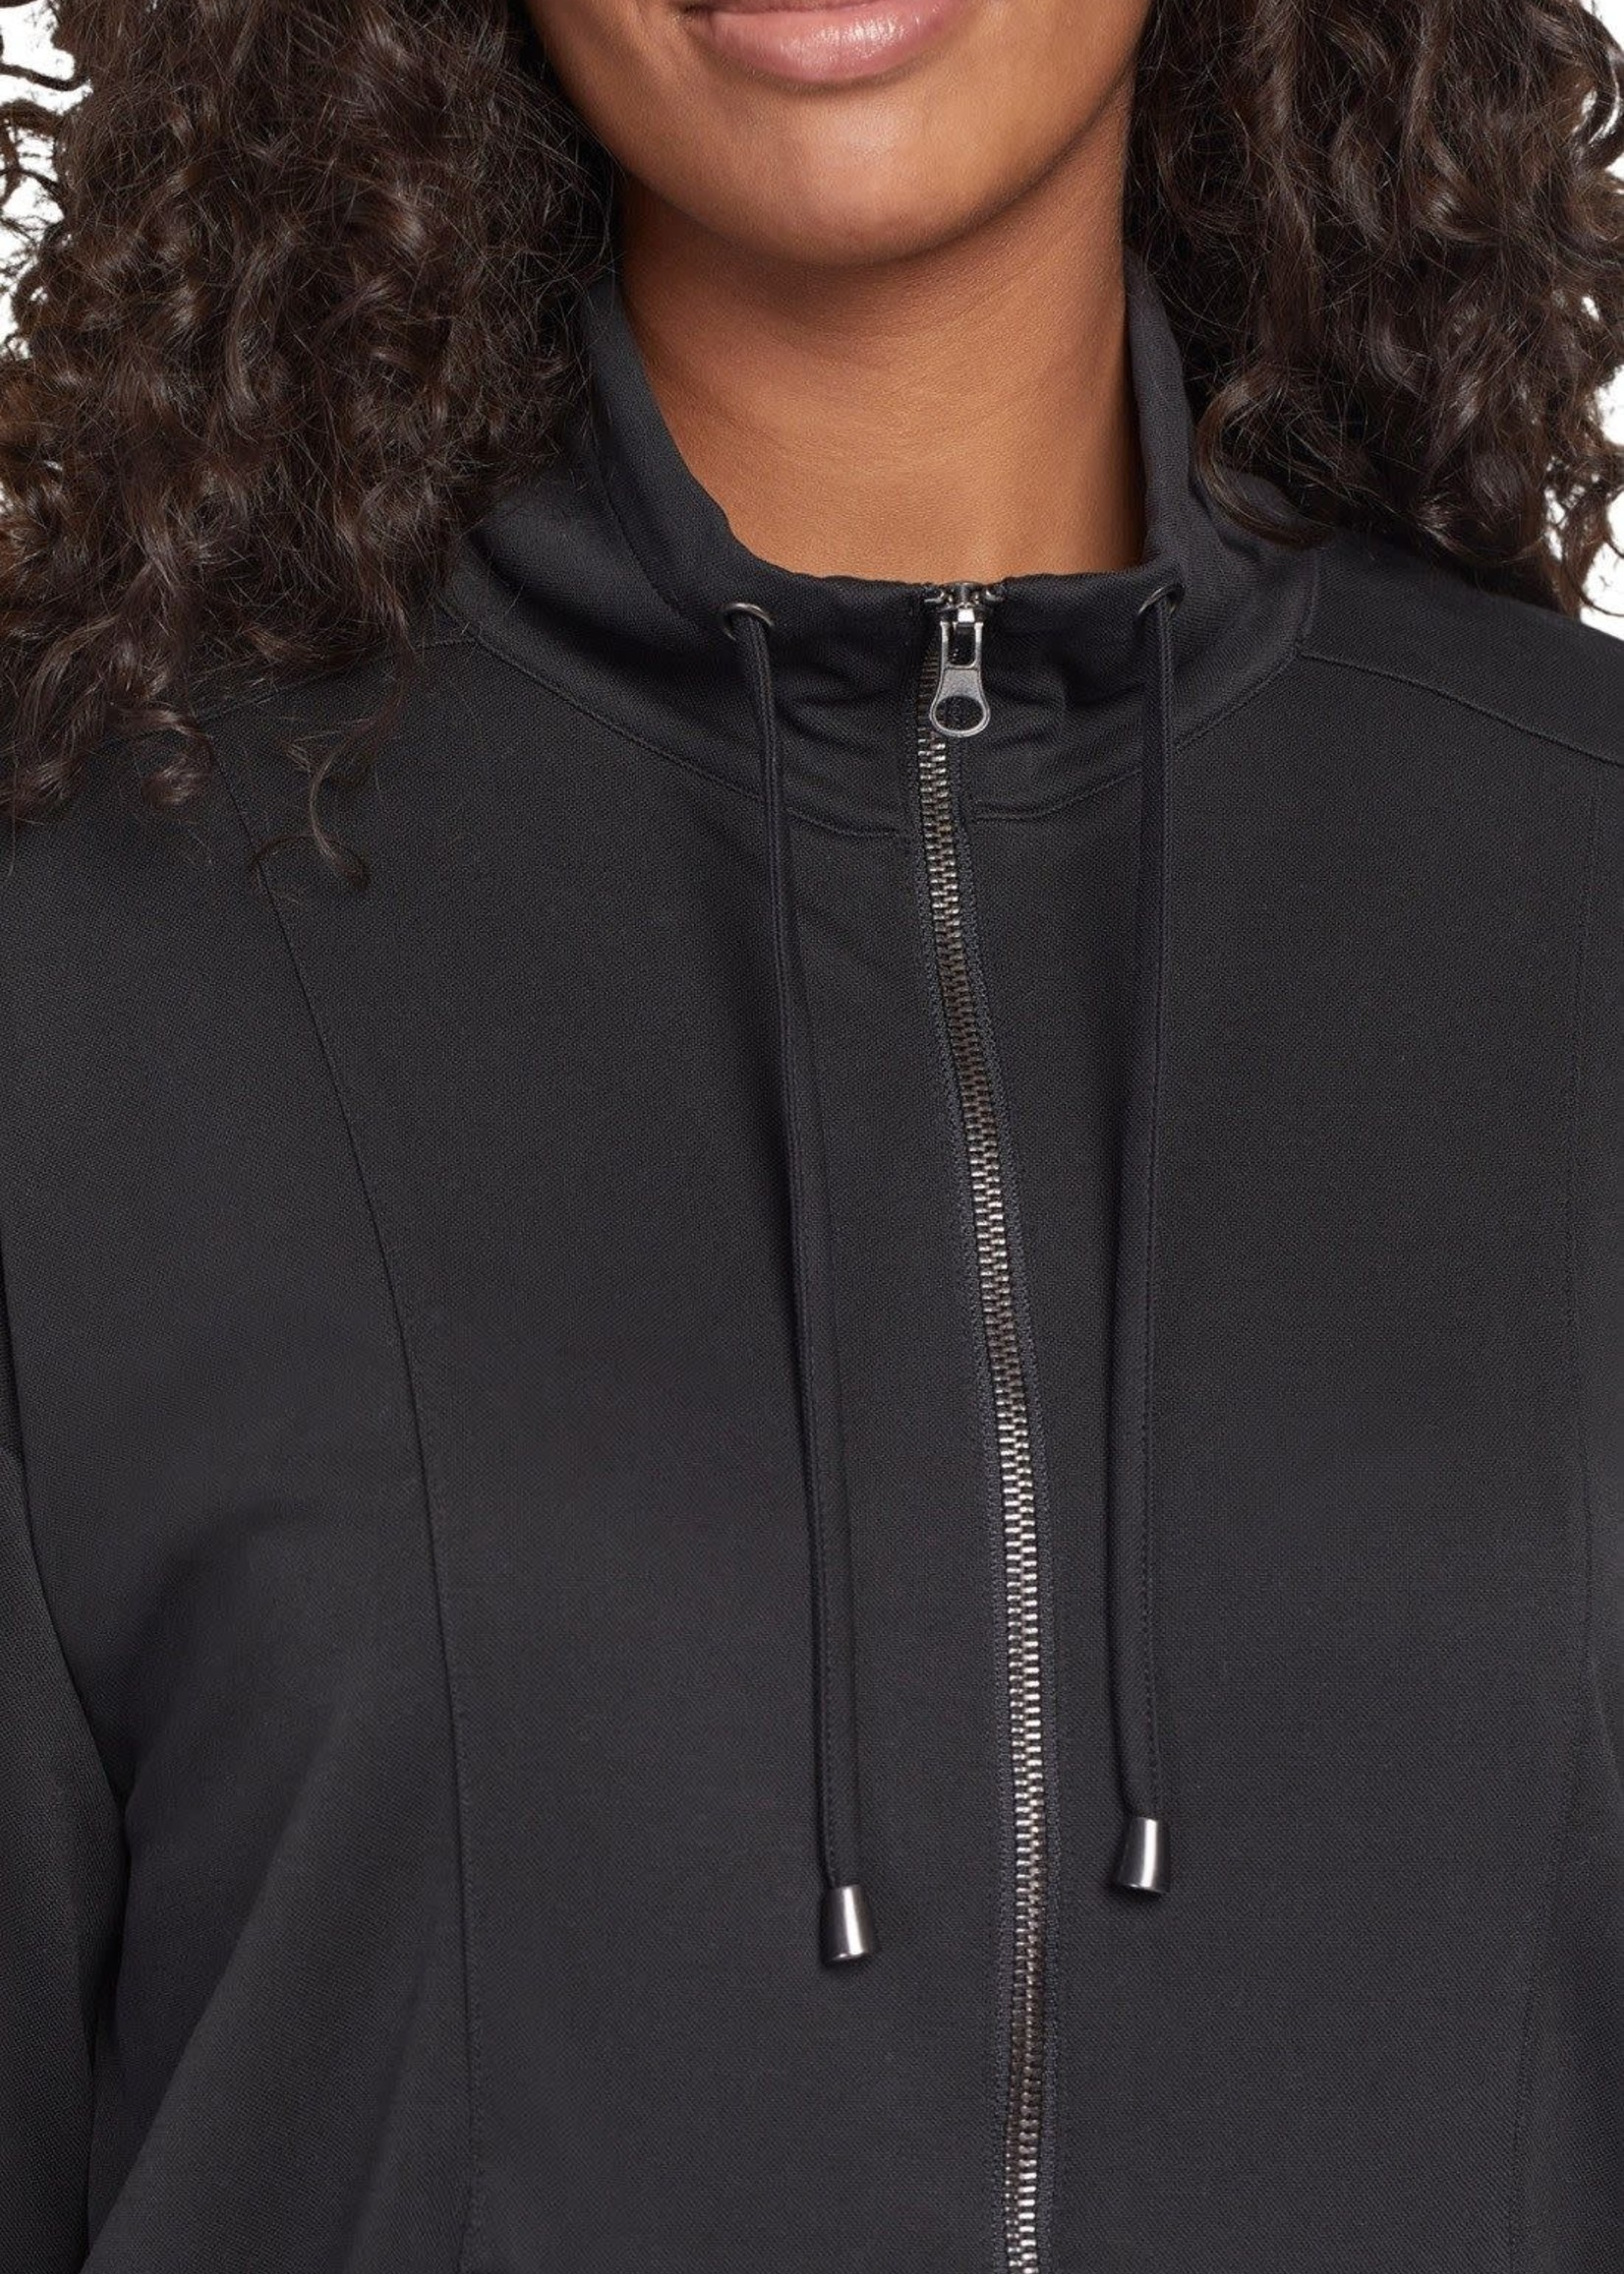 Tribal Tribal L/S Zip Front Jacket